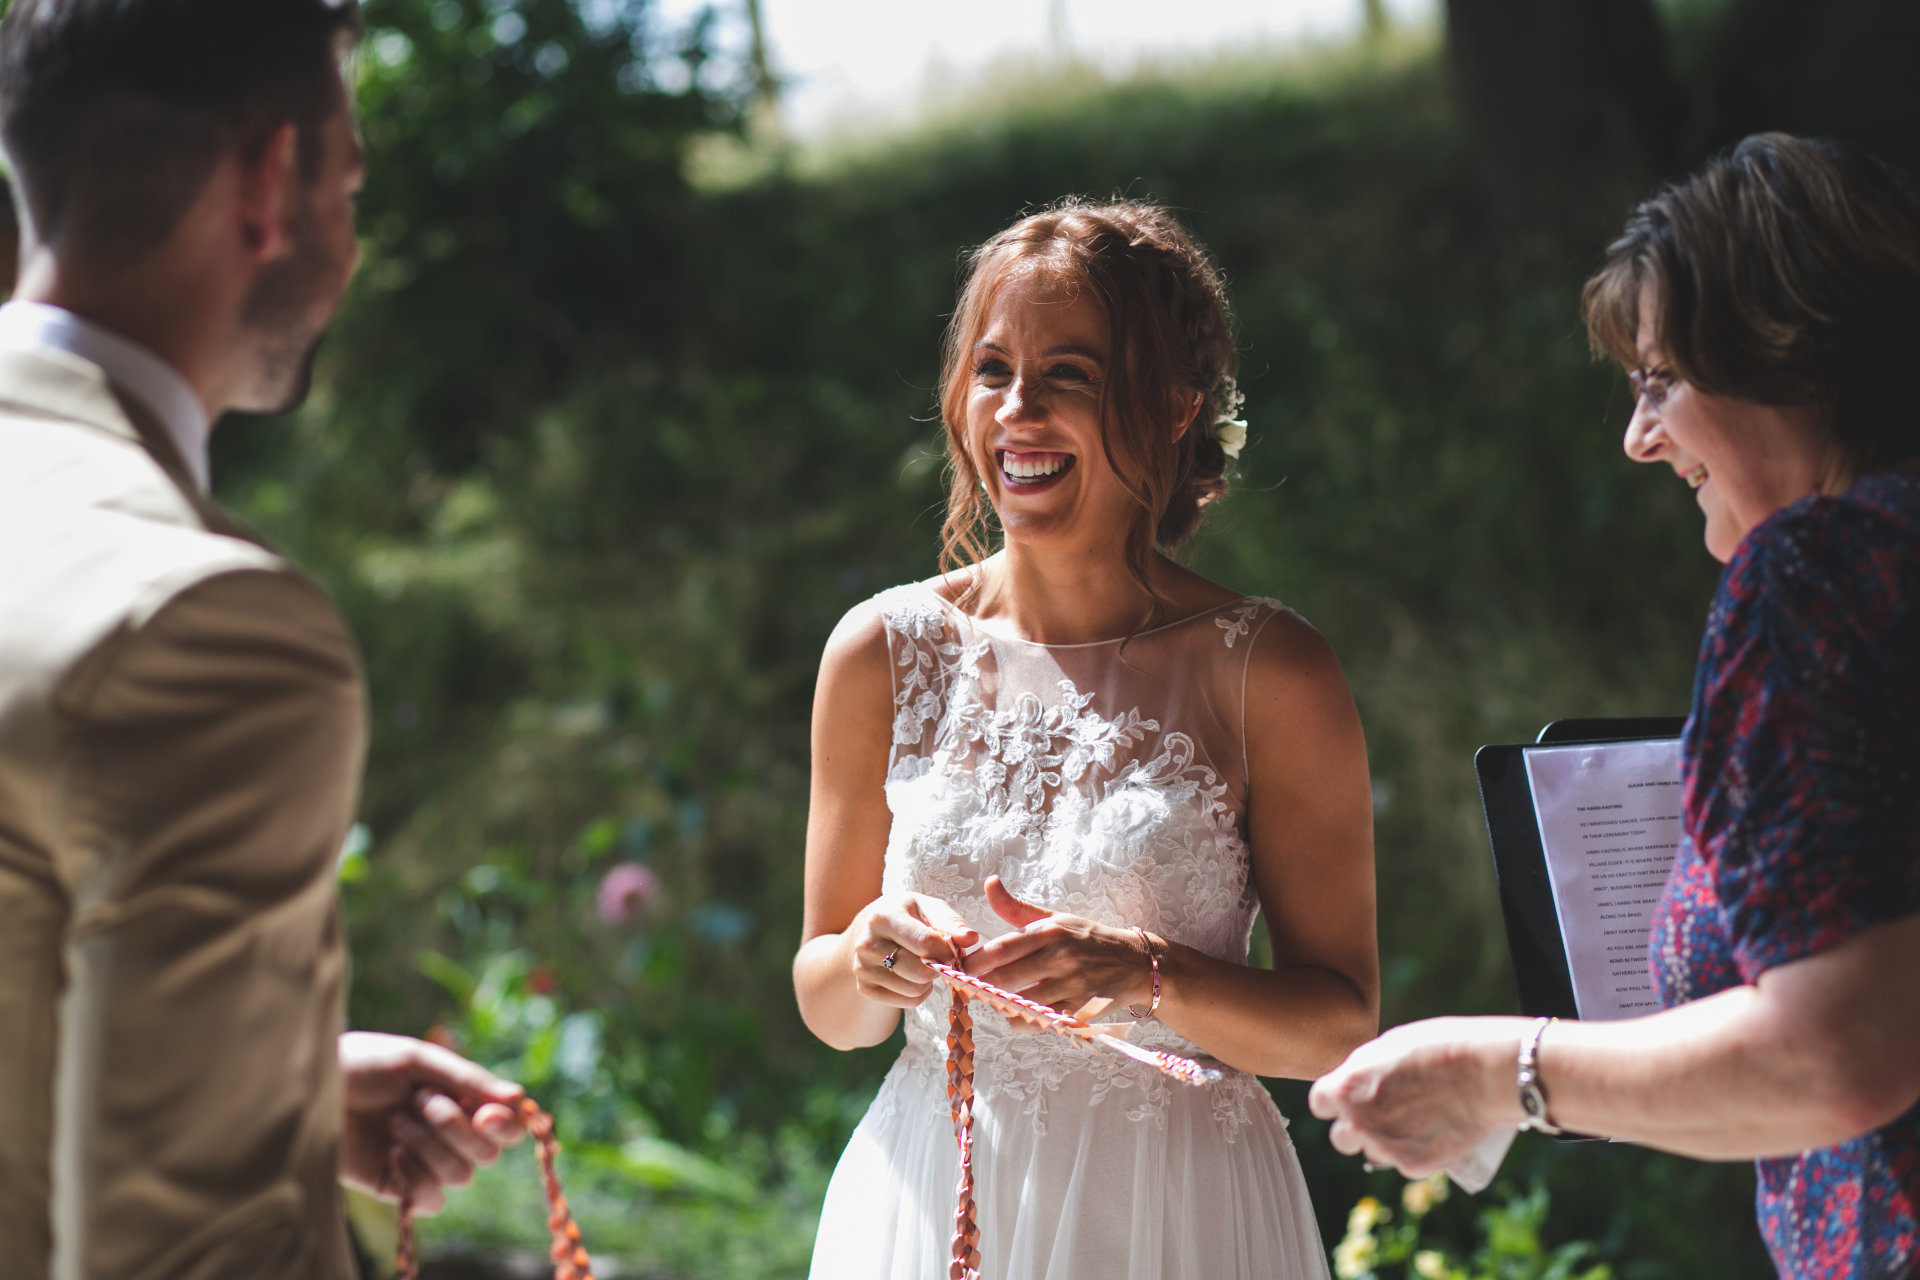 the beautiful bride enjoying the summer sunshine